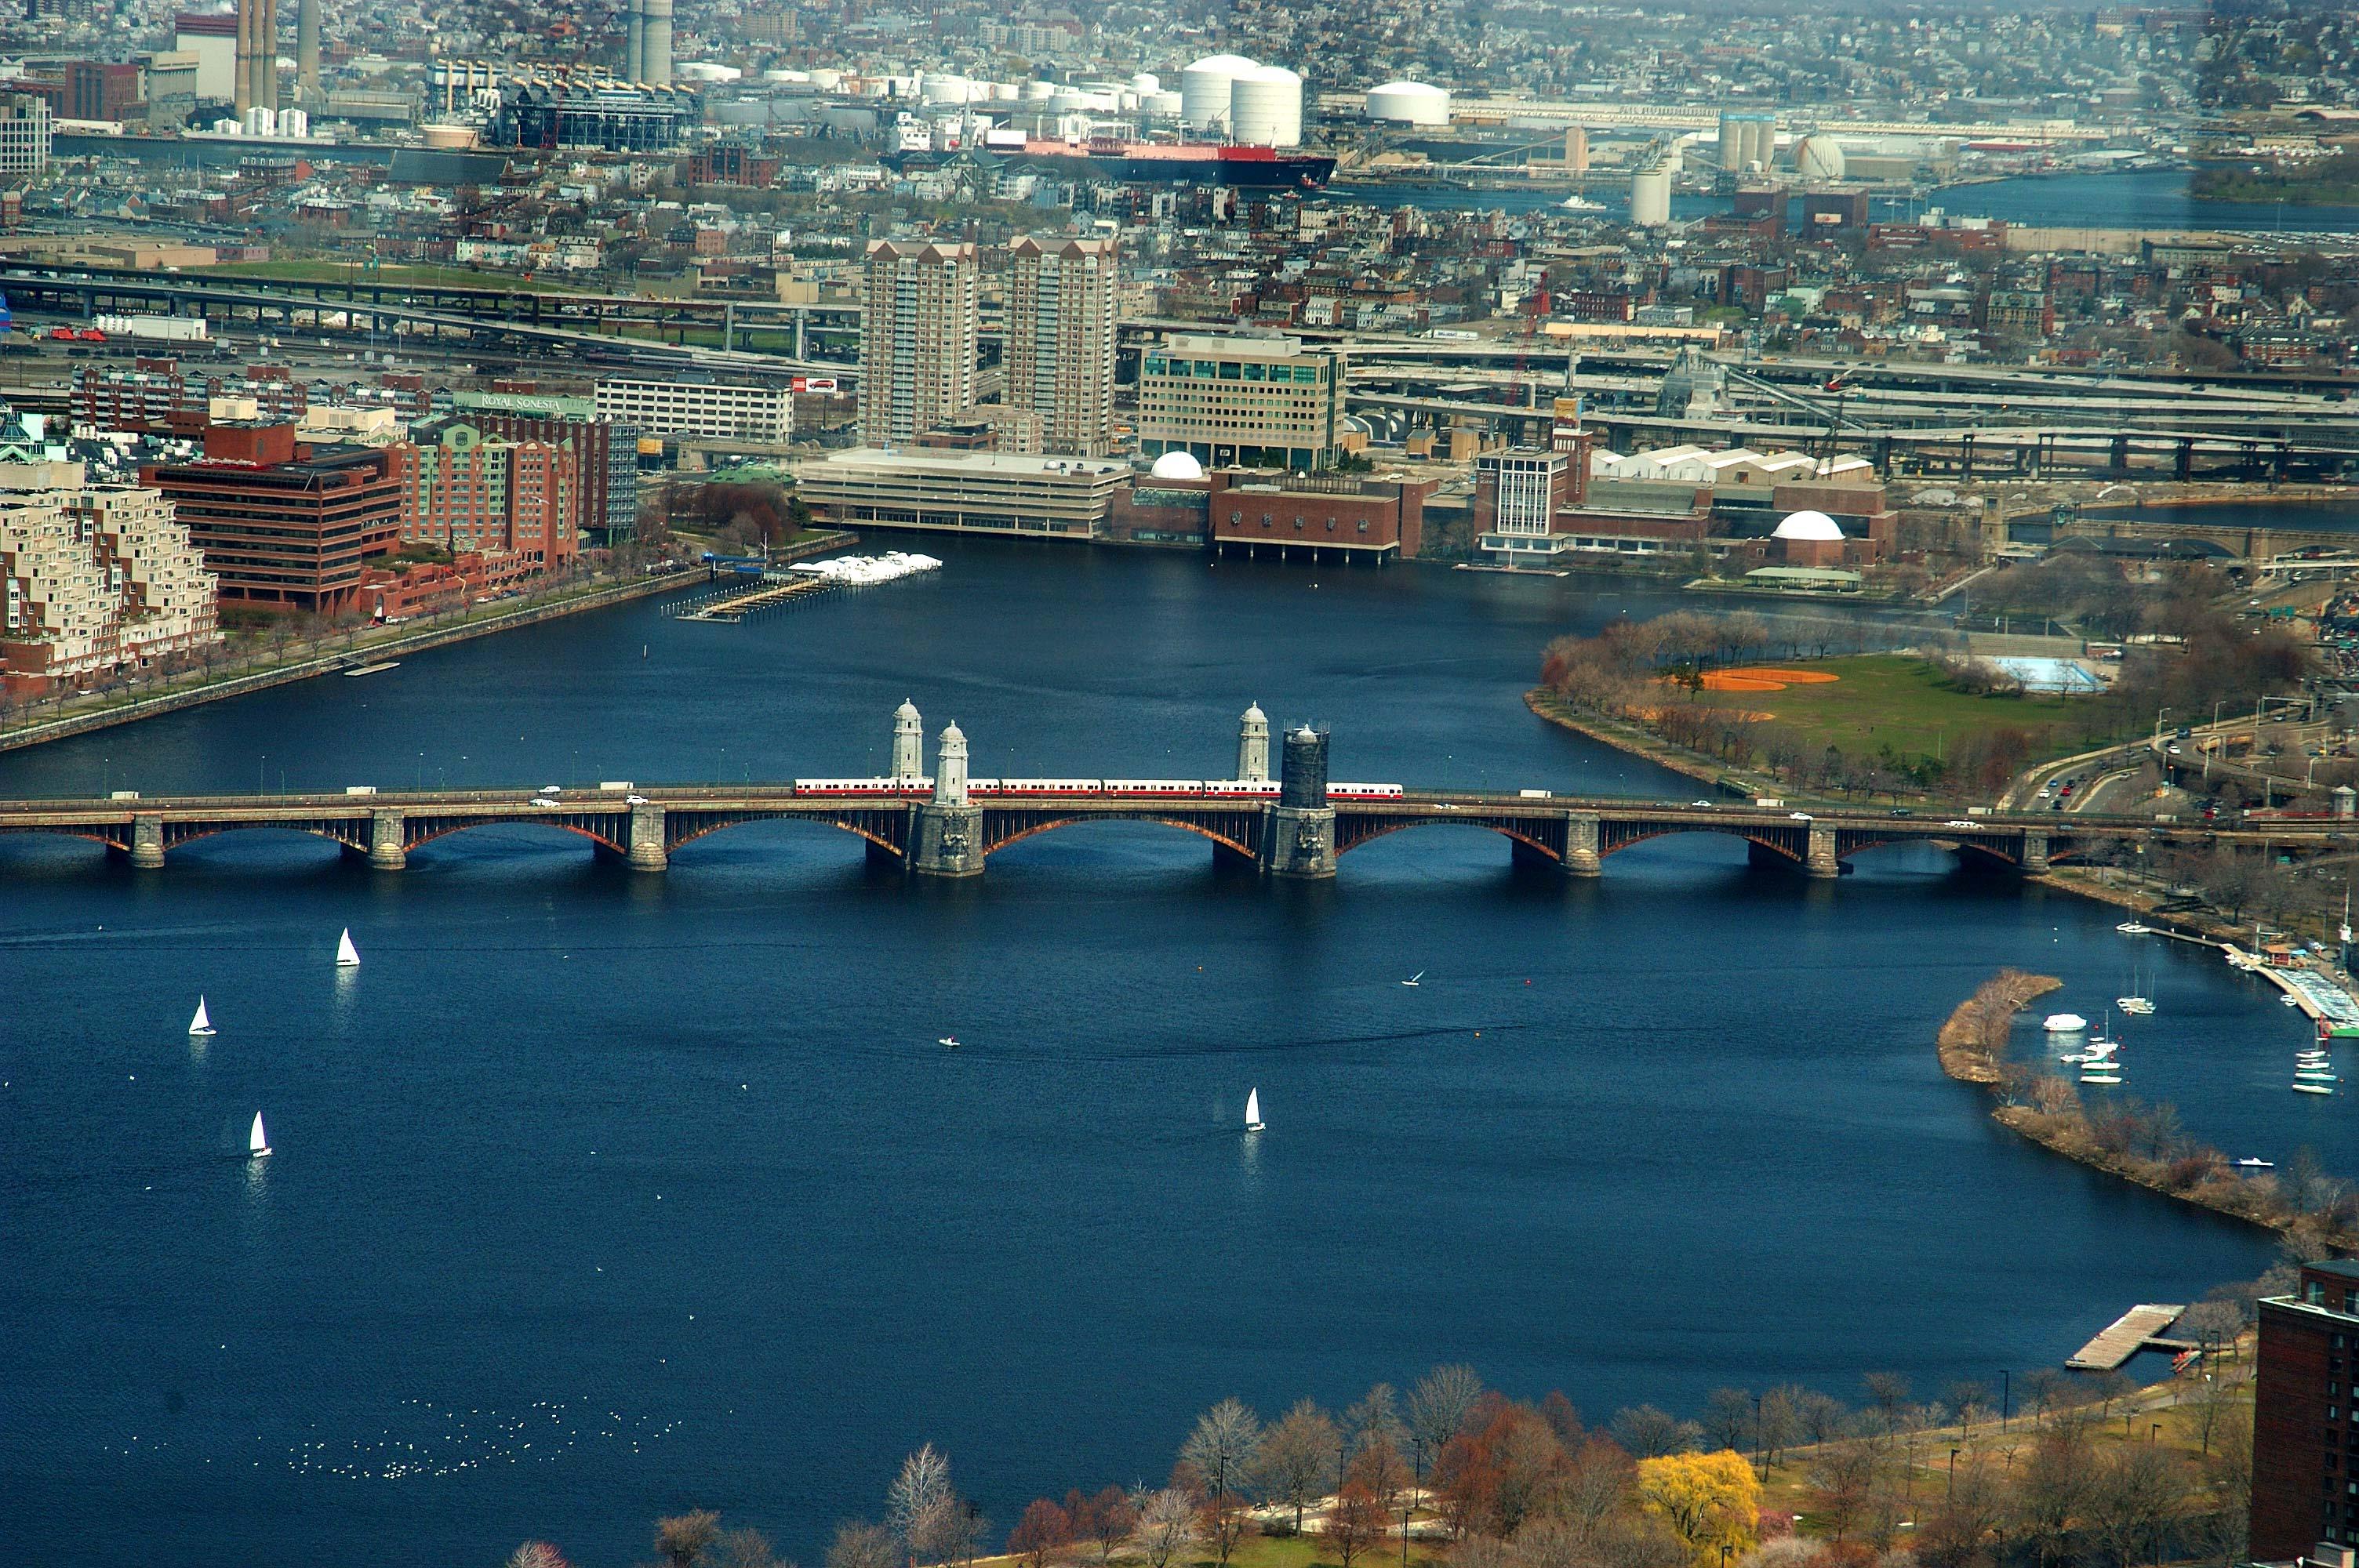 New England Fall Wallpaper Photo 337 12 Long Fellow Bridge Across Charles River From